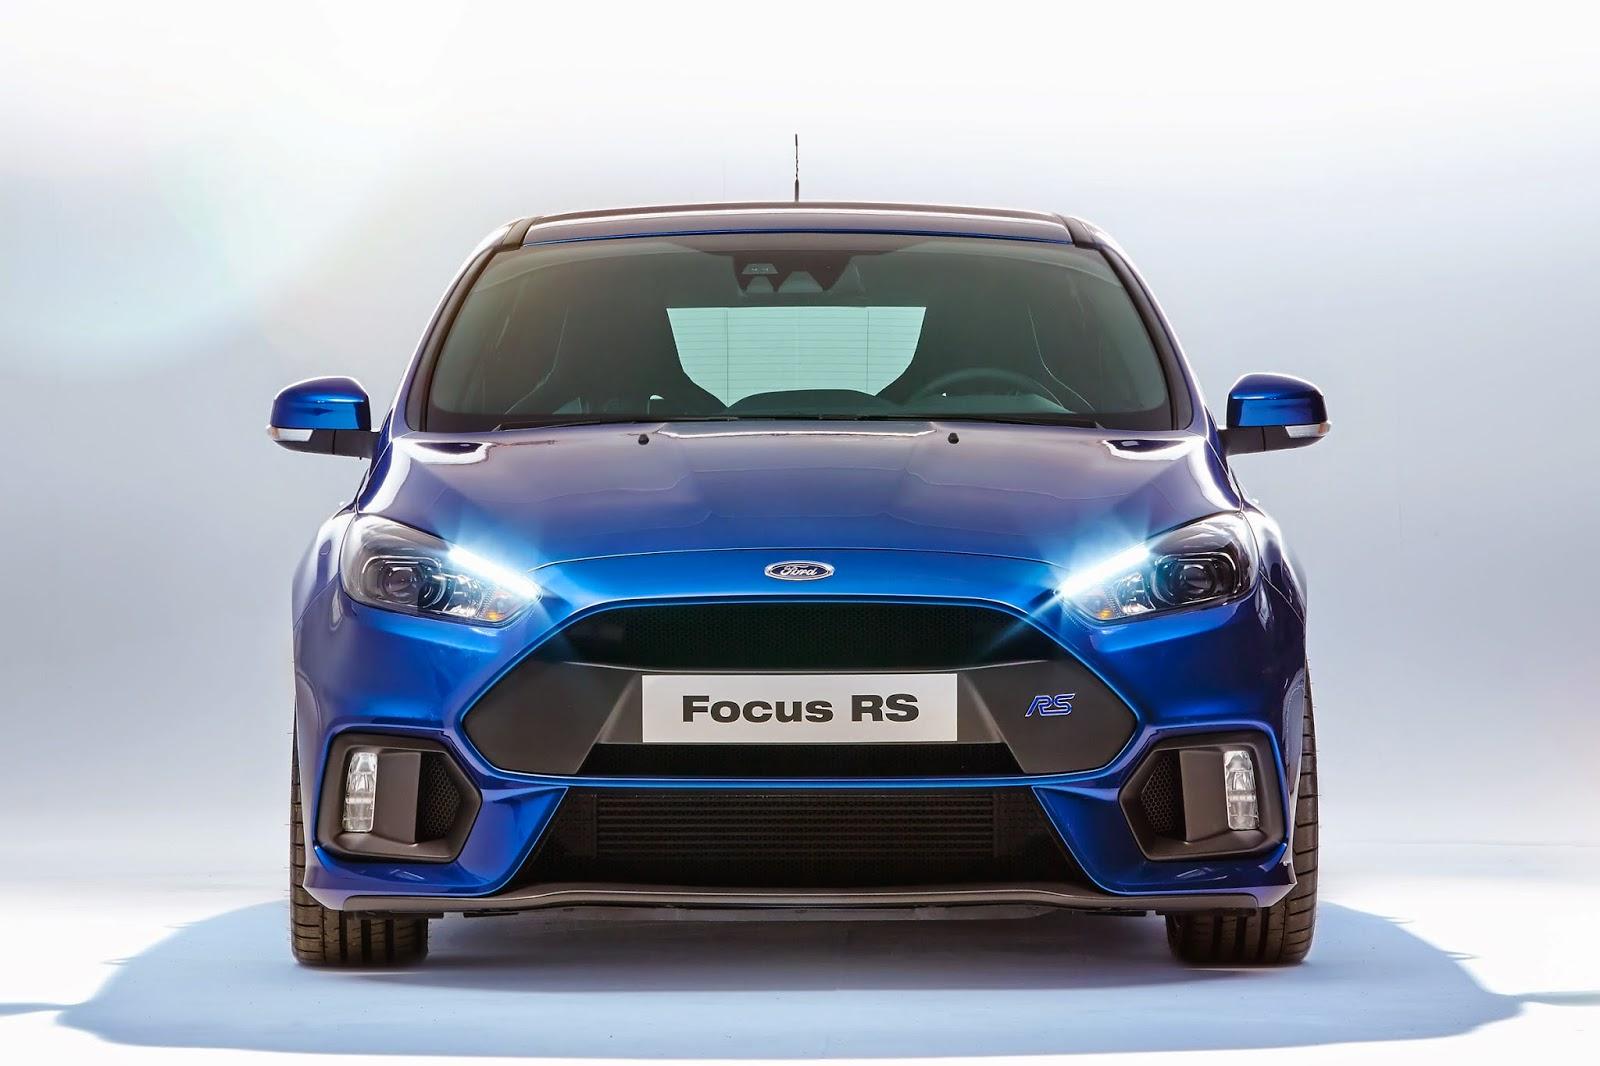 ford focus rs wallpaper,land vehicle,vehicle,car,motor vehicle,automotive design